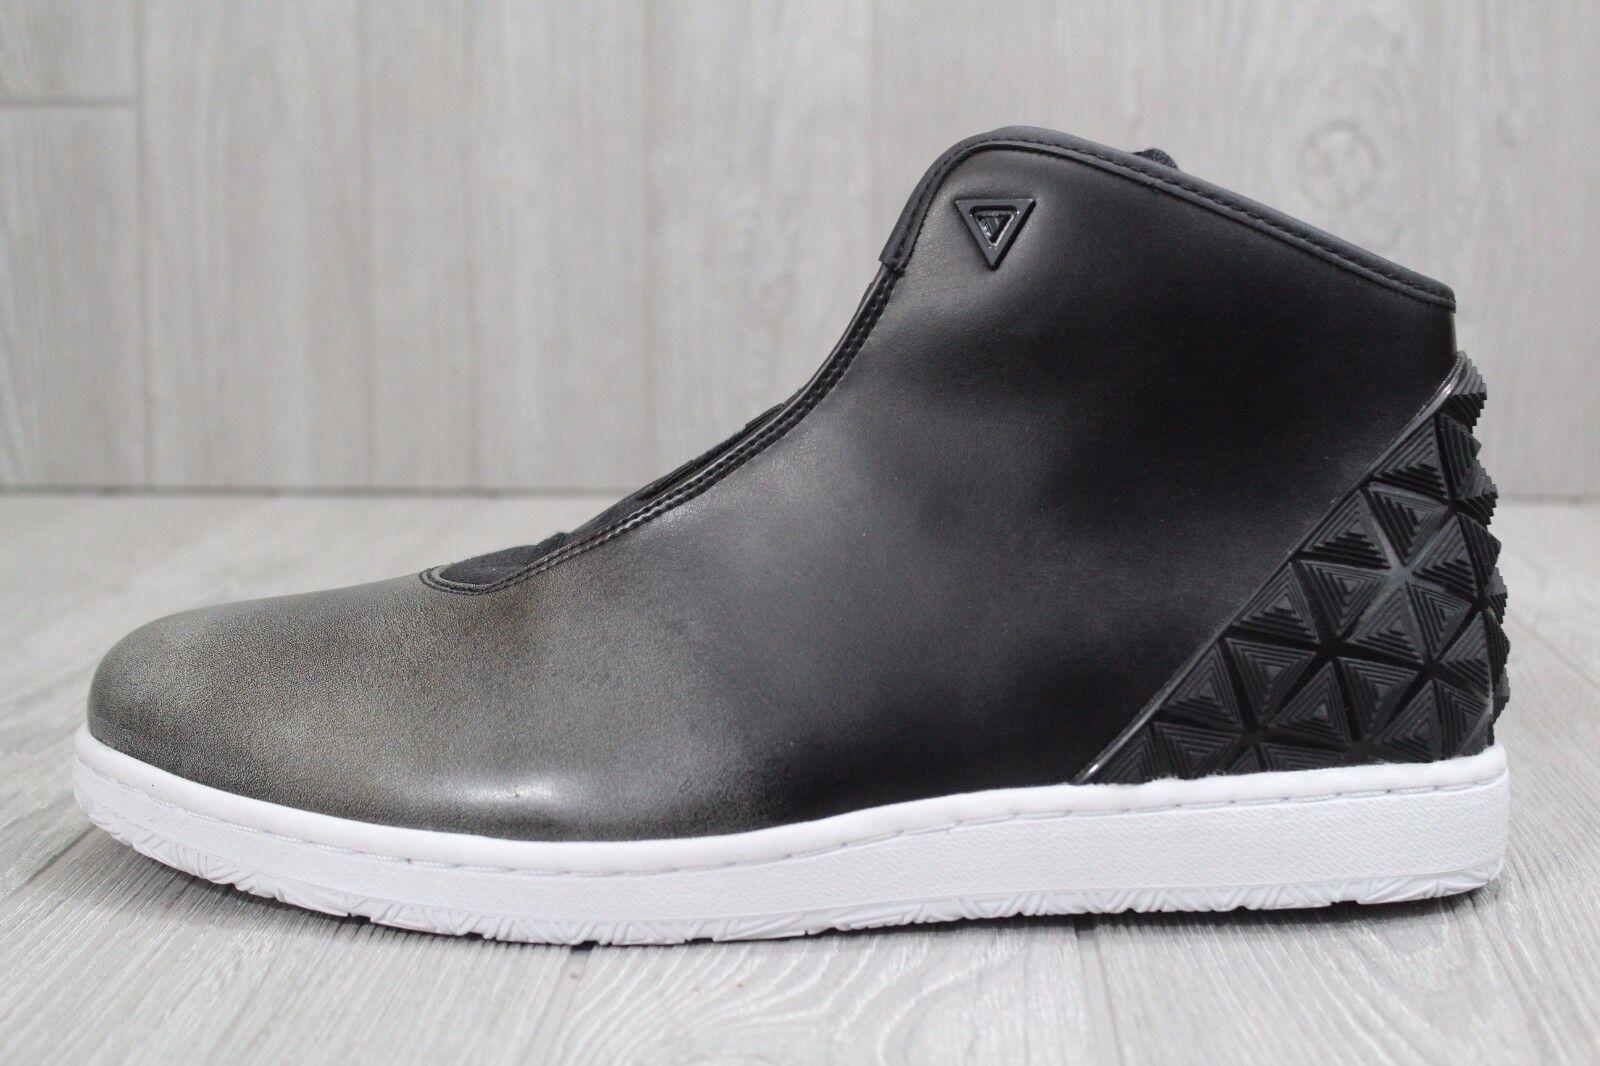 23 New Men's Jordan Instigator Off Court Black Basketball Shoes 705076 006 12.5